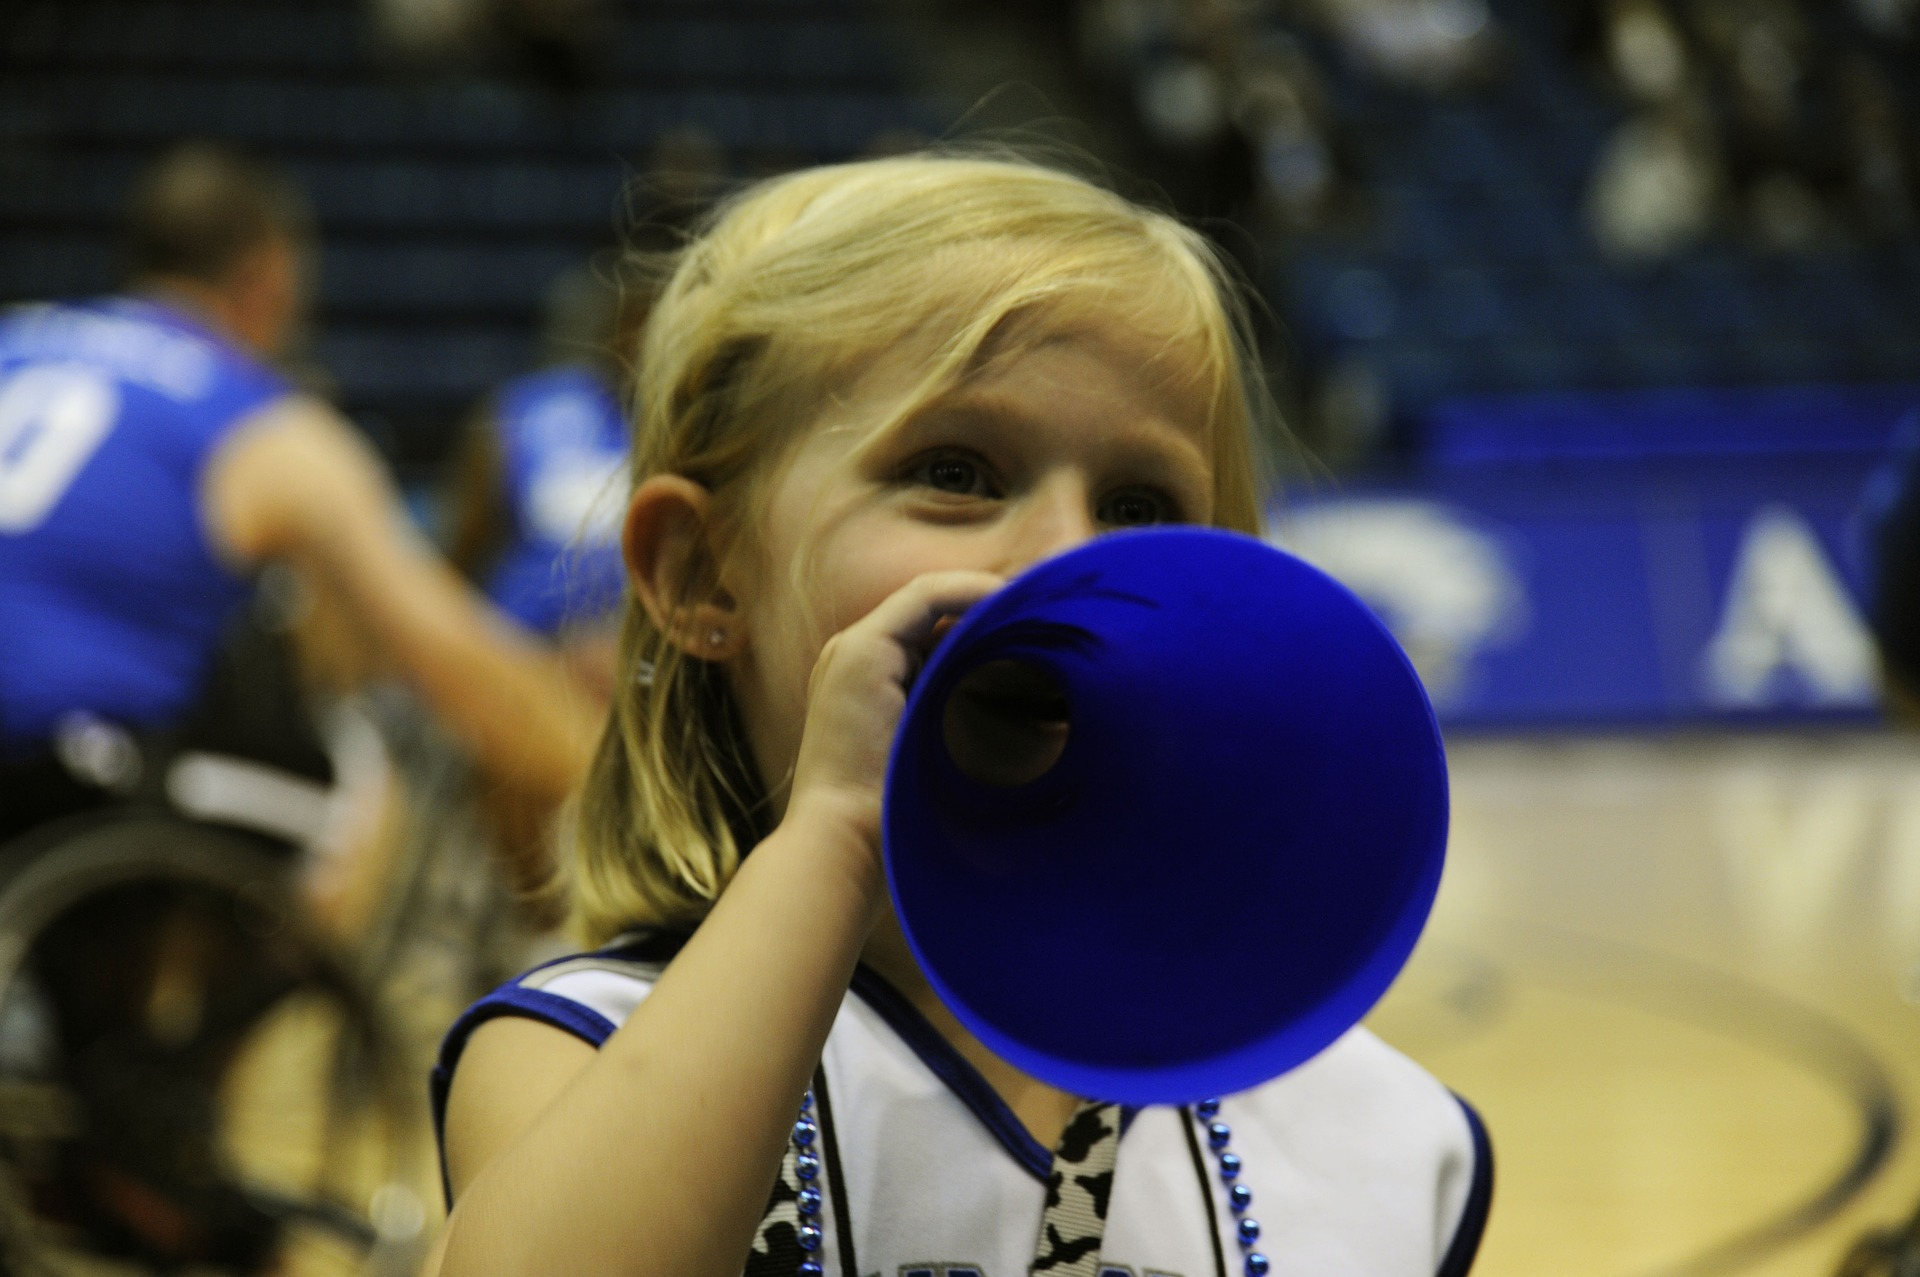 cheerleader-673490_1920.jpg